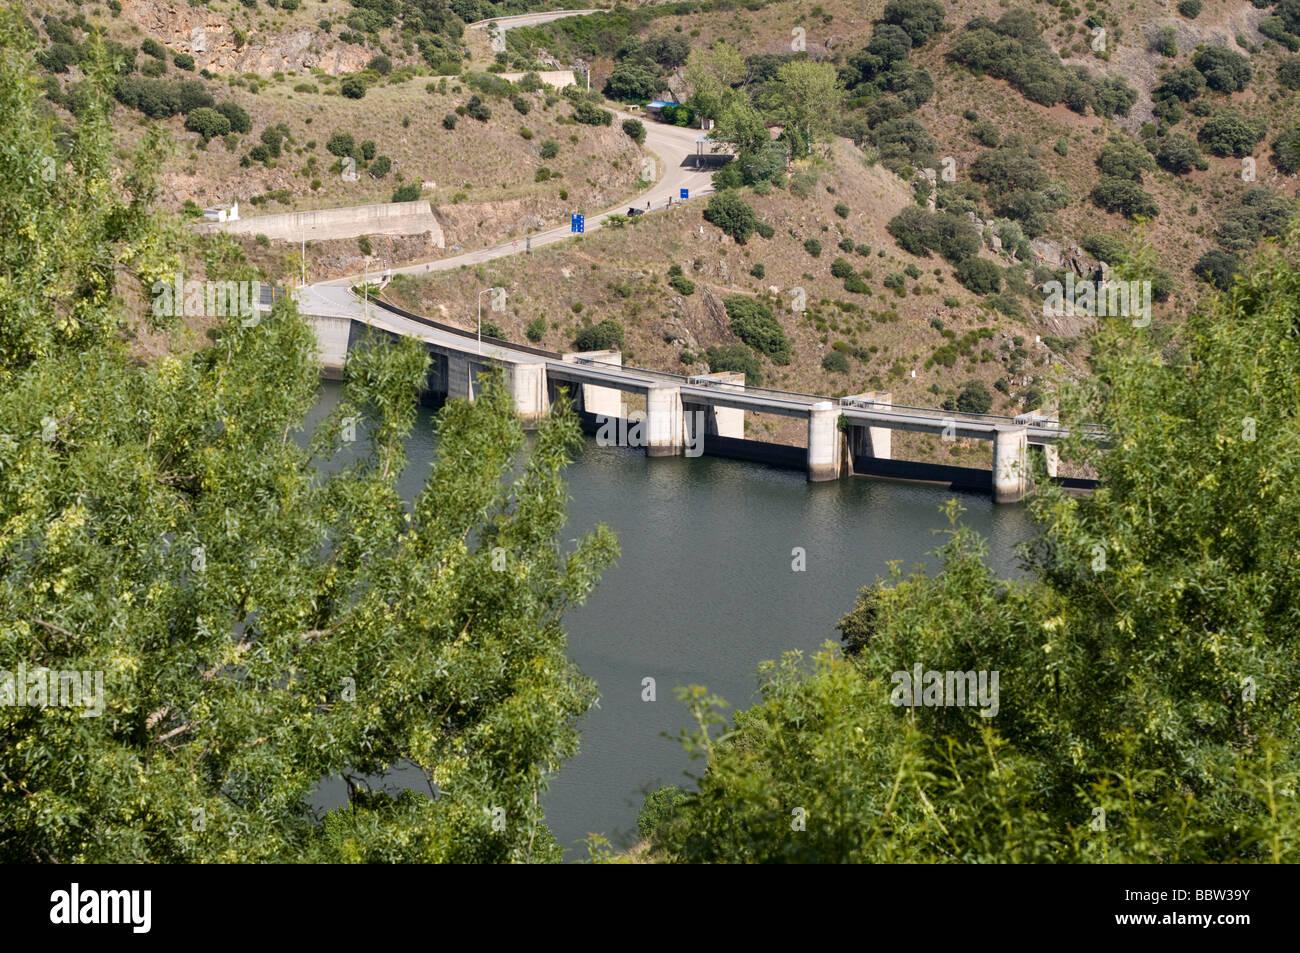 Presa de Miranda do Douro, Portugal Imagen De Stock